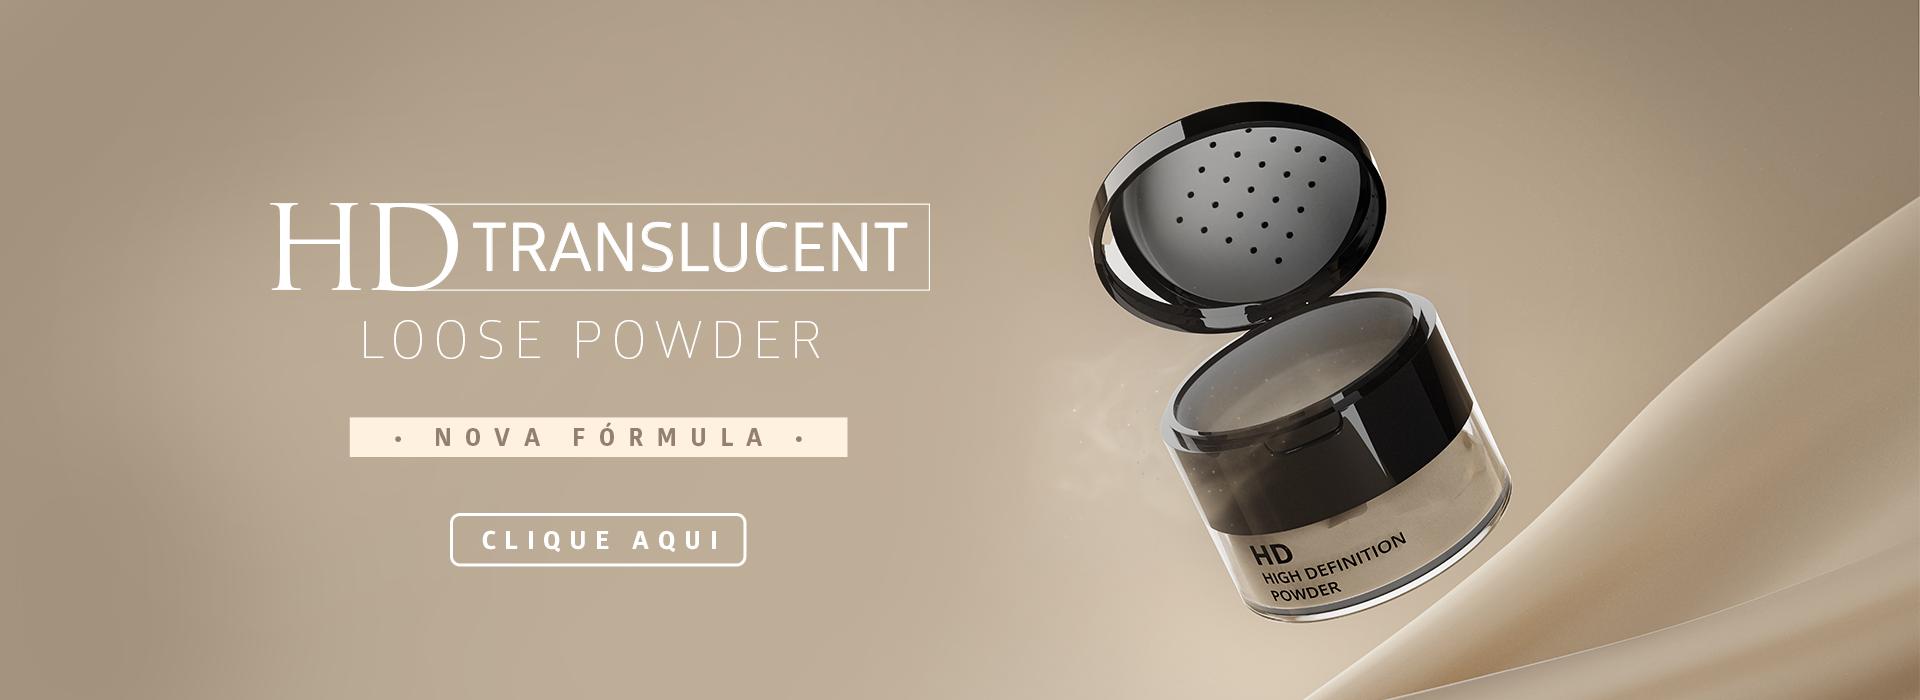 hd-translucent-loose-powder